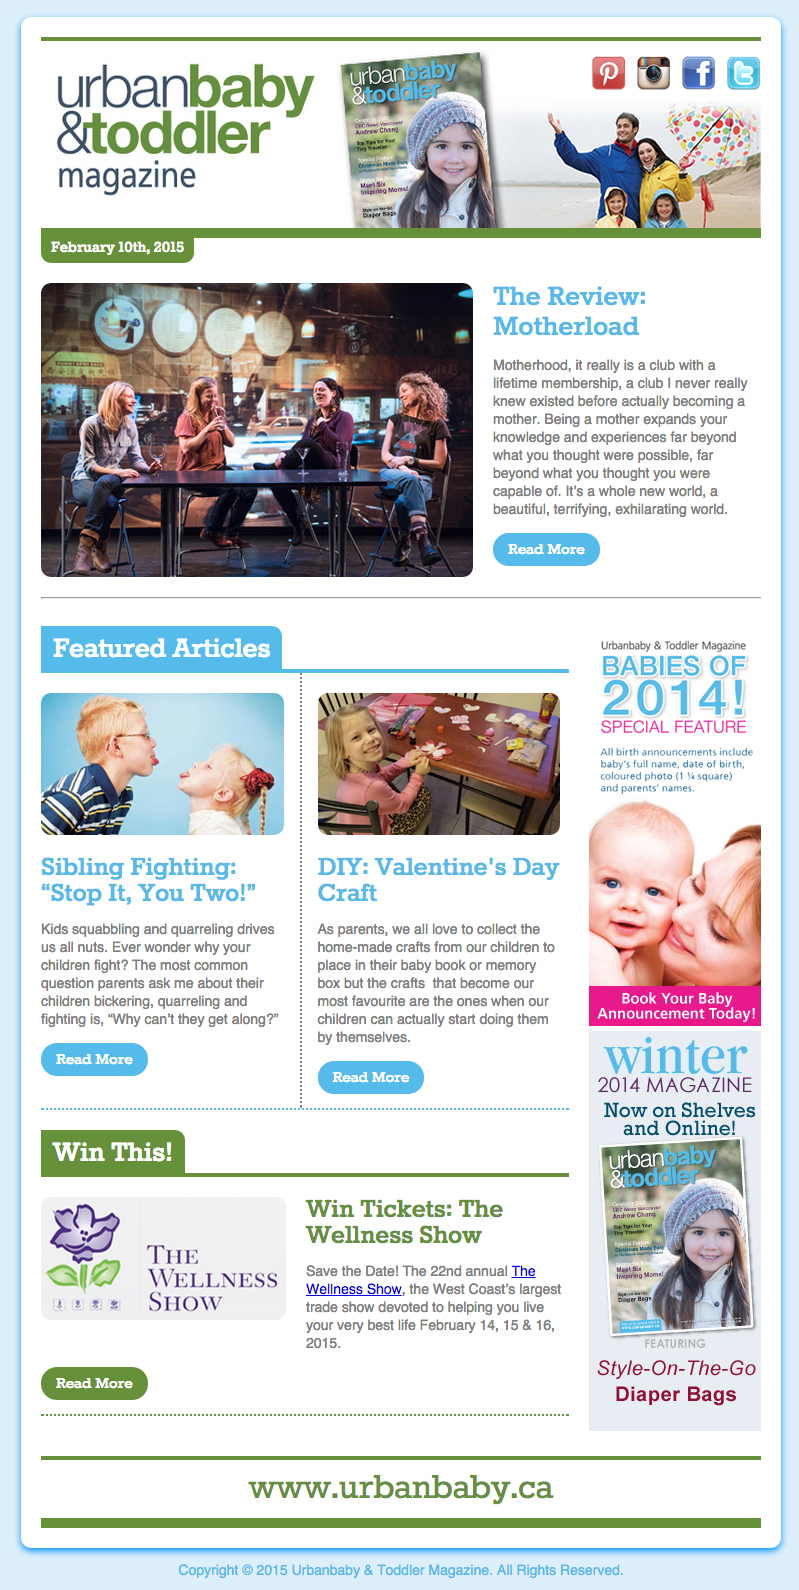 Urbanbaby & Toddler Magazine E-Newsletter